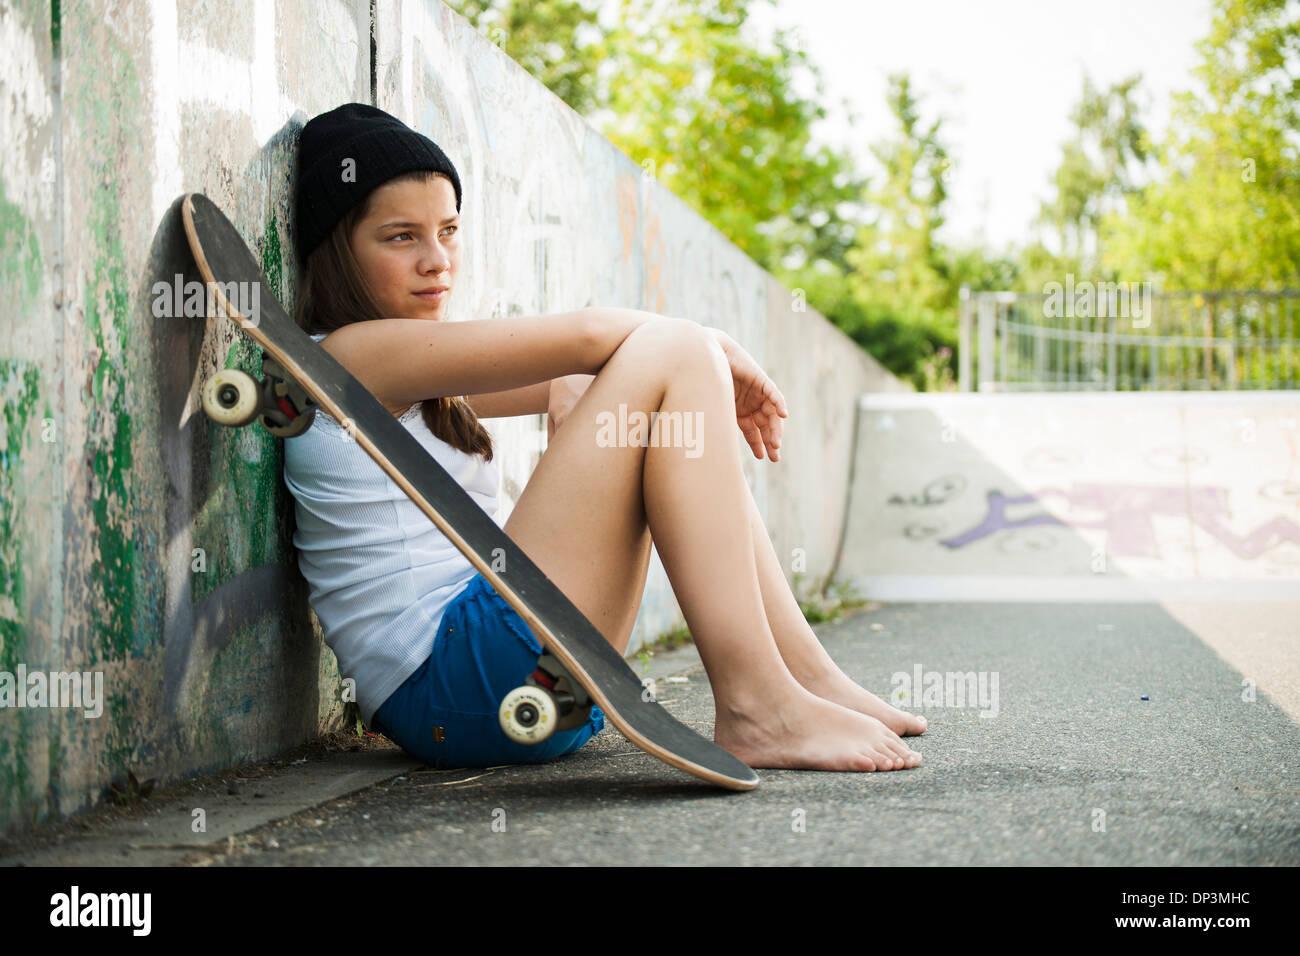 https://c8.alamy.com/comp/DP3MHC/girl-hanging-out-in-skatepark-feudenheim-mannheim-baden-wurttemberg-DP3MHC.jpg